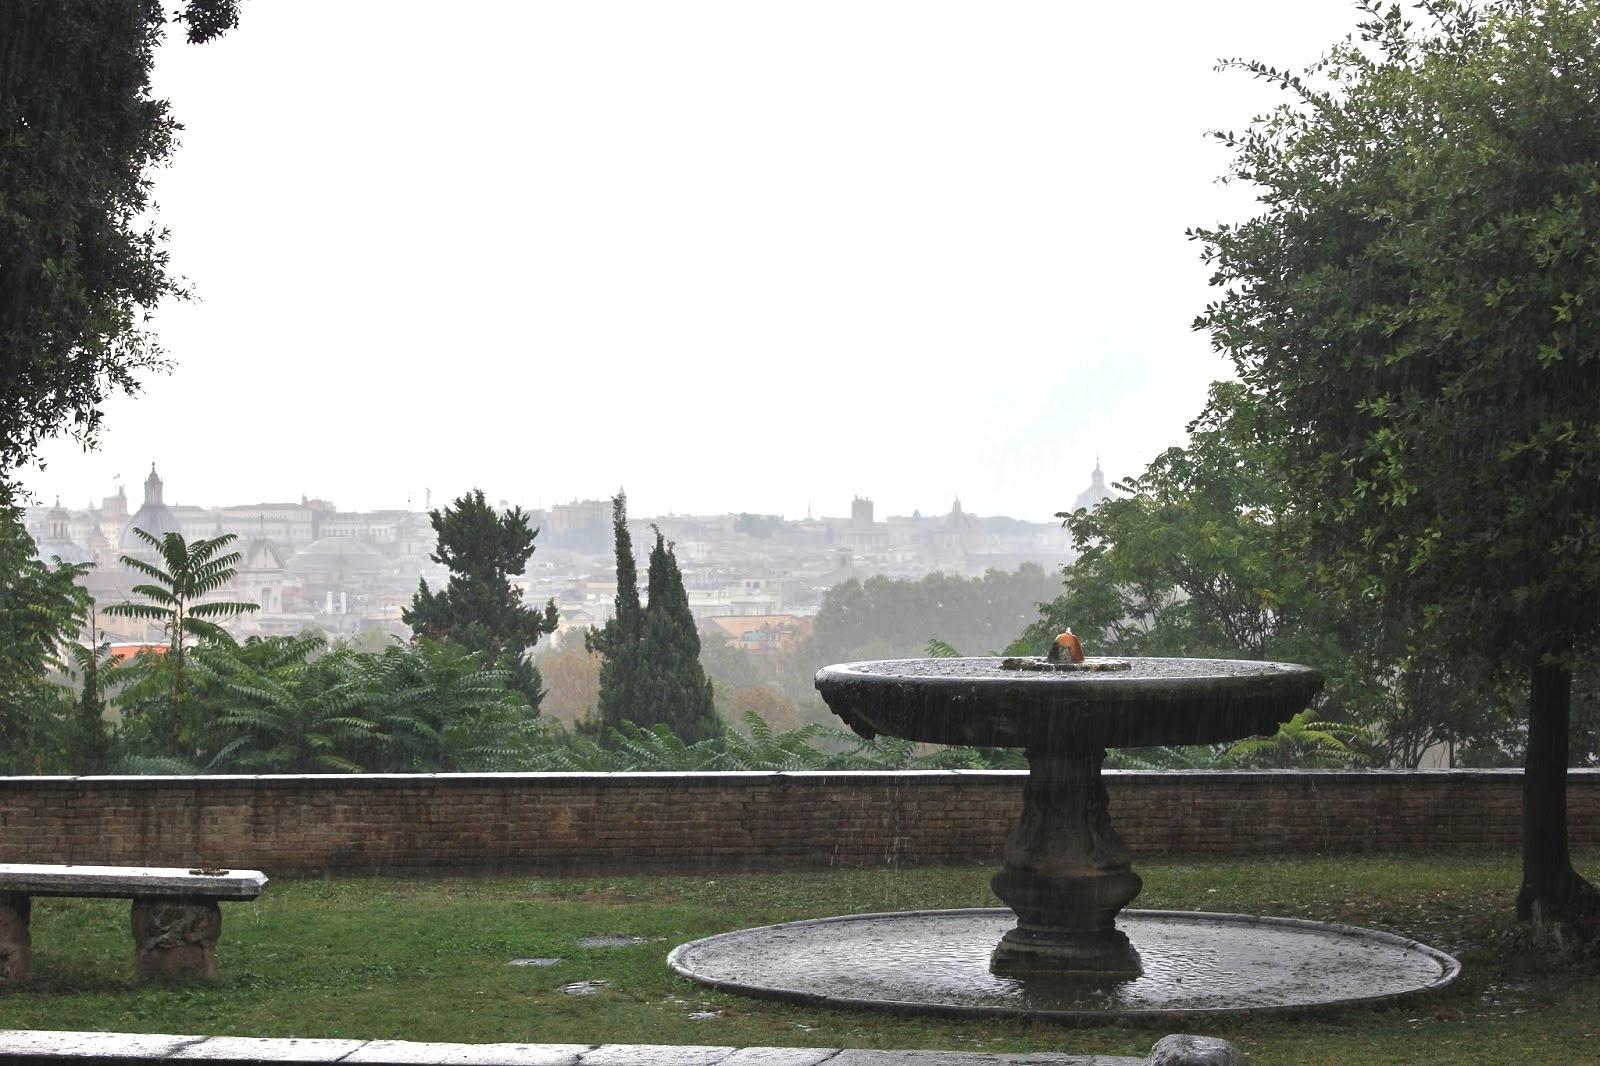 холм Яникул, Рим, Италия